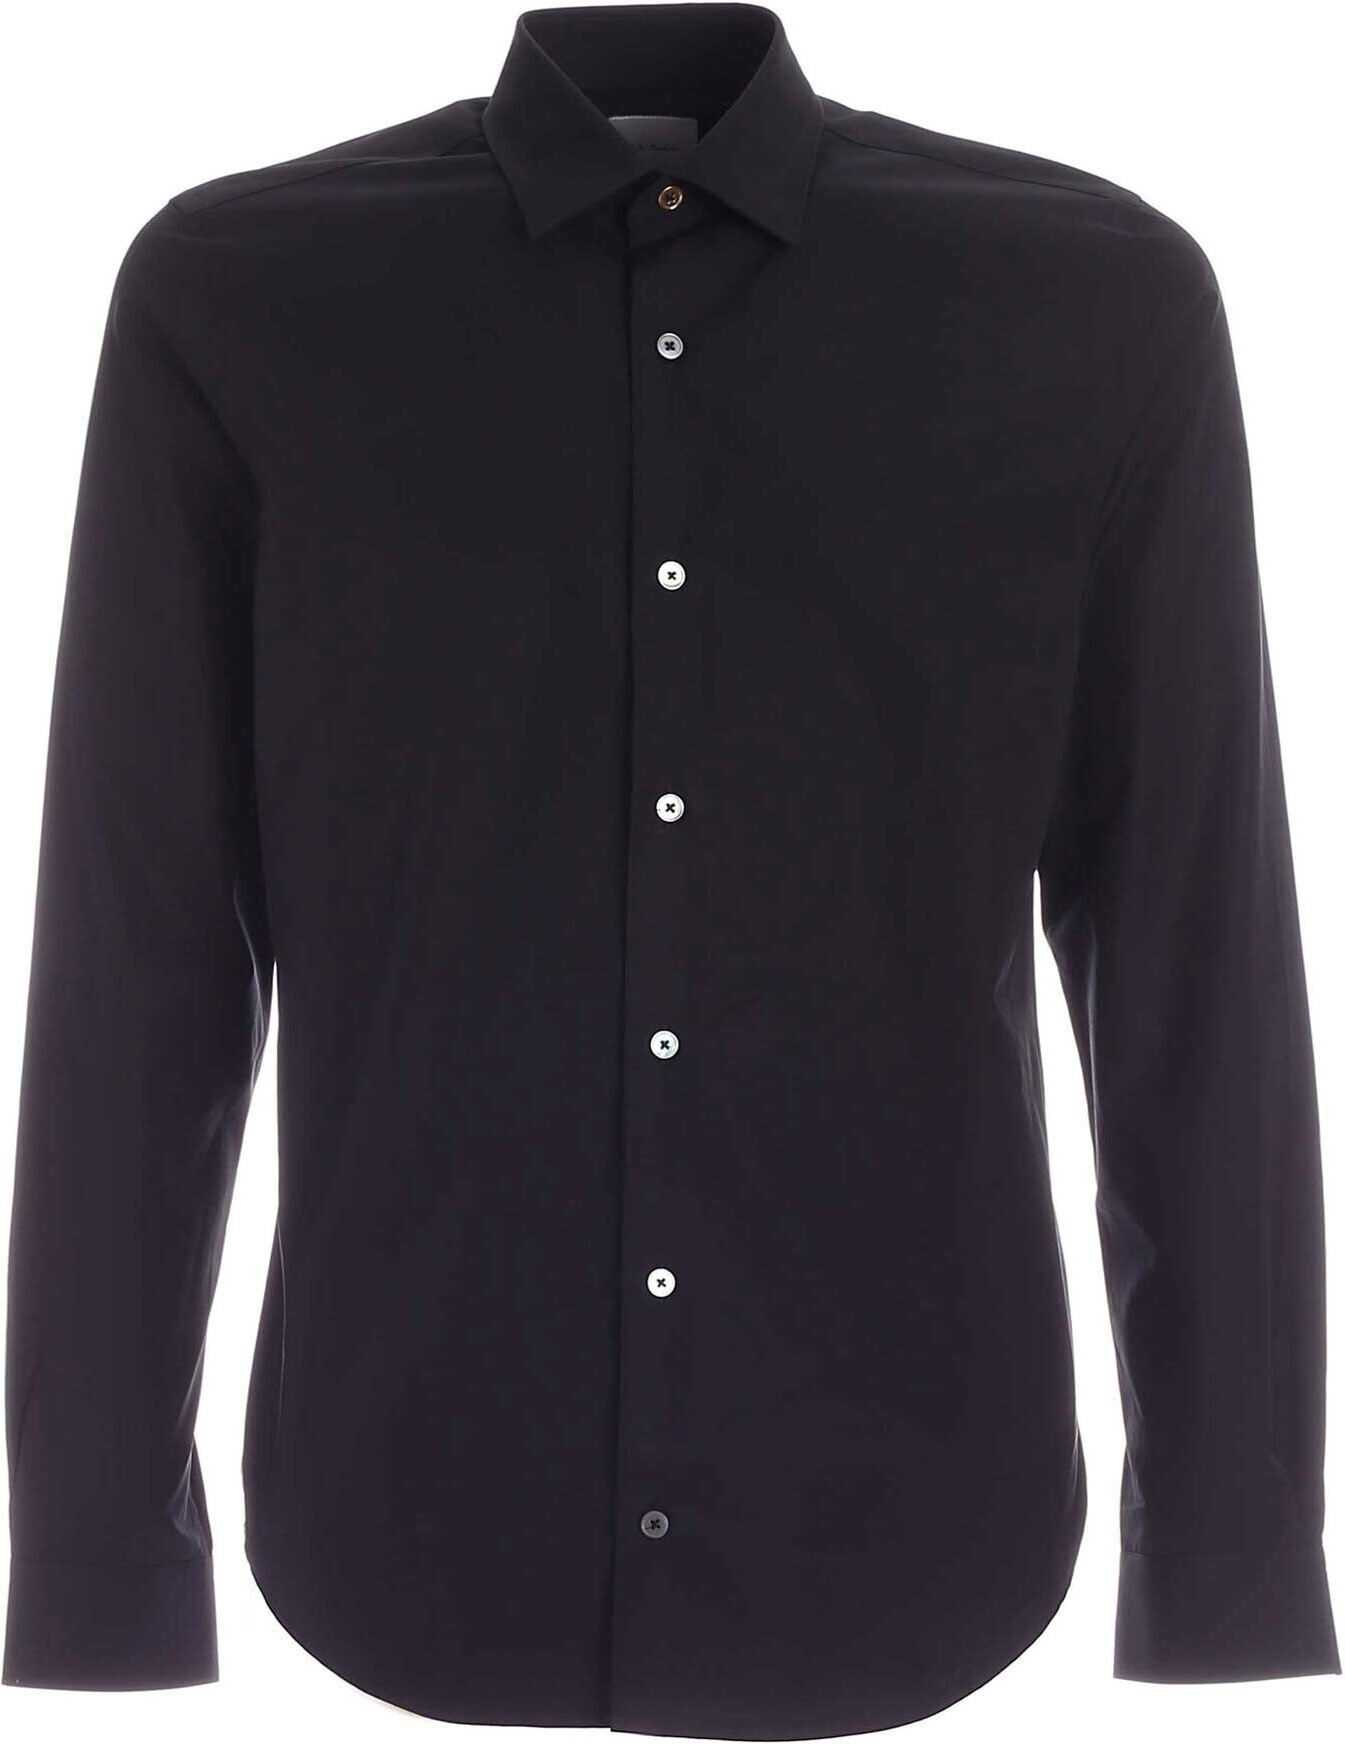 Paul Smith Kensington Fit Shirt In Black Black imagine